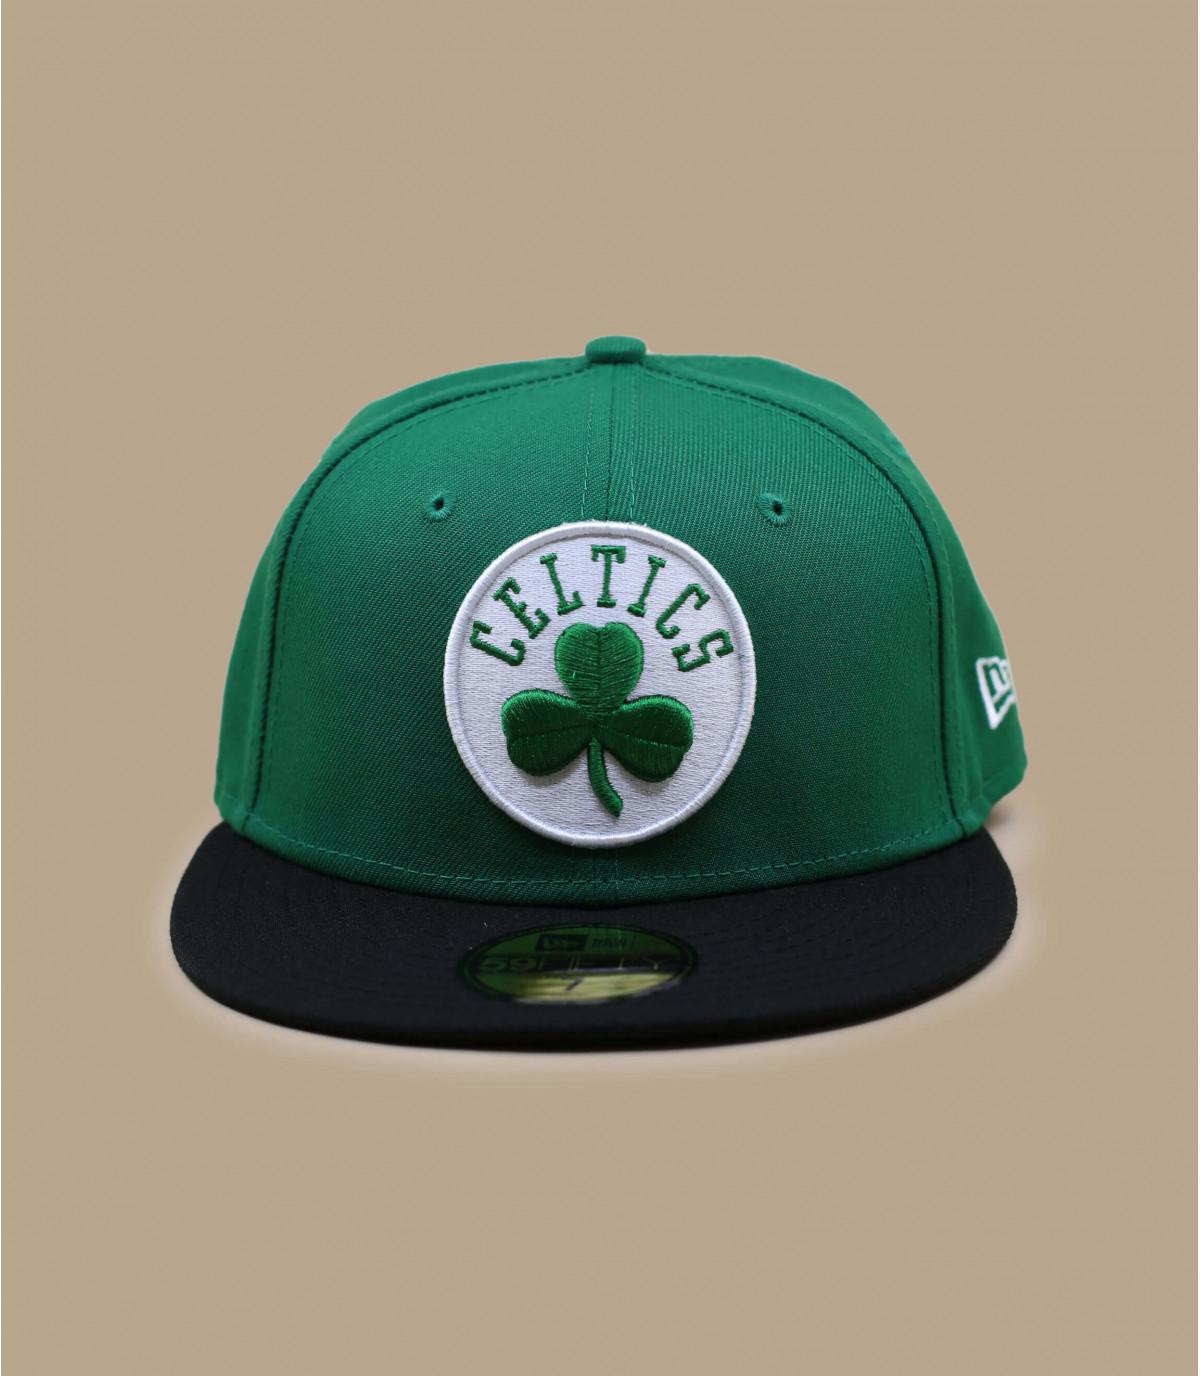 Casquette nba Celtics